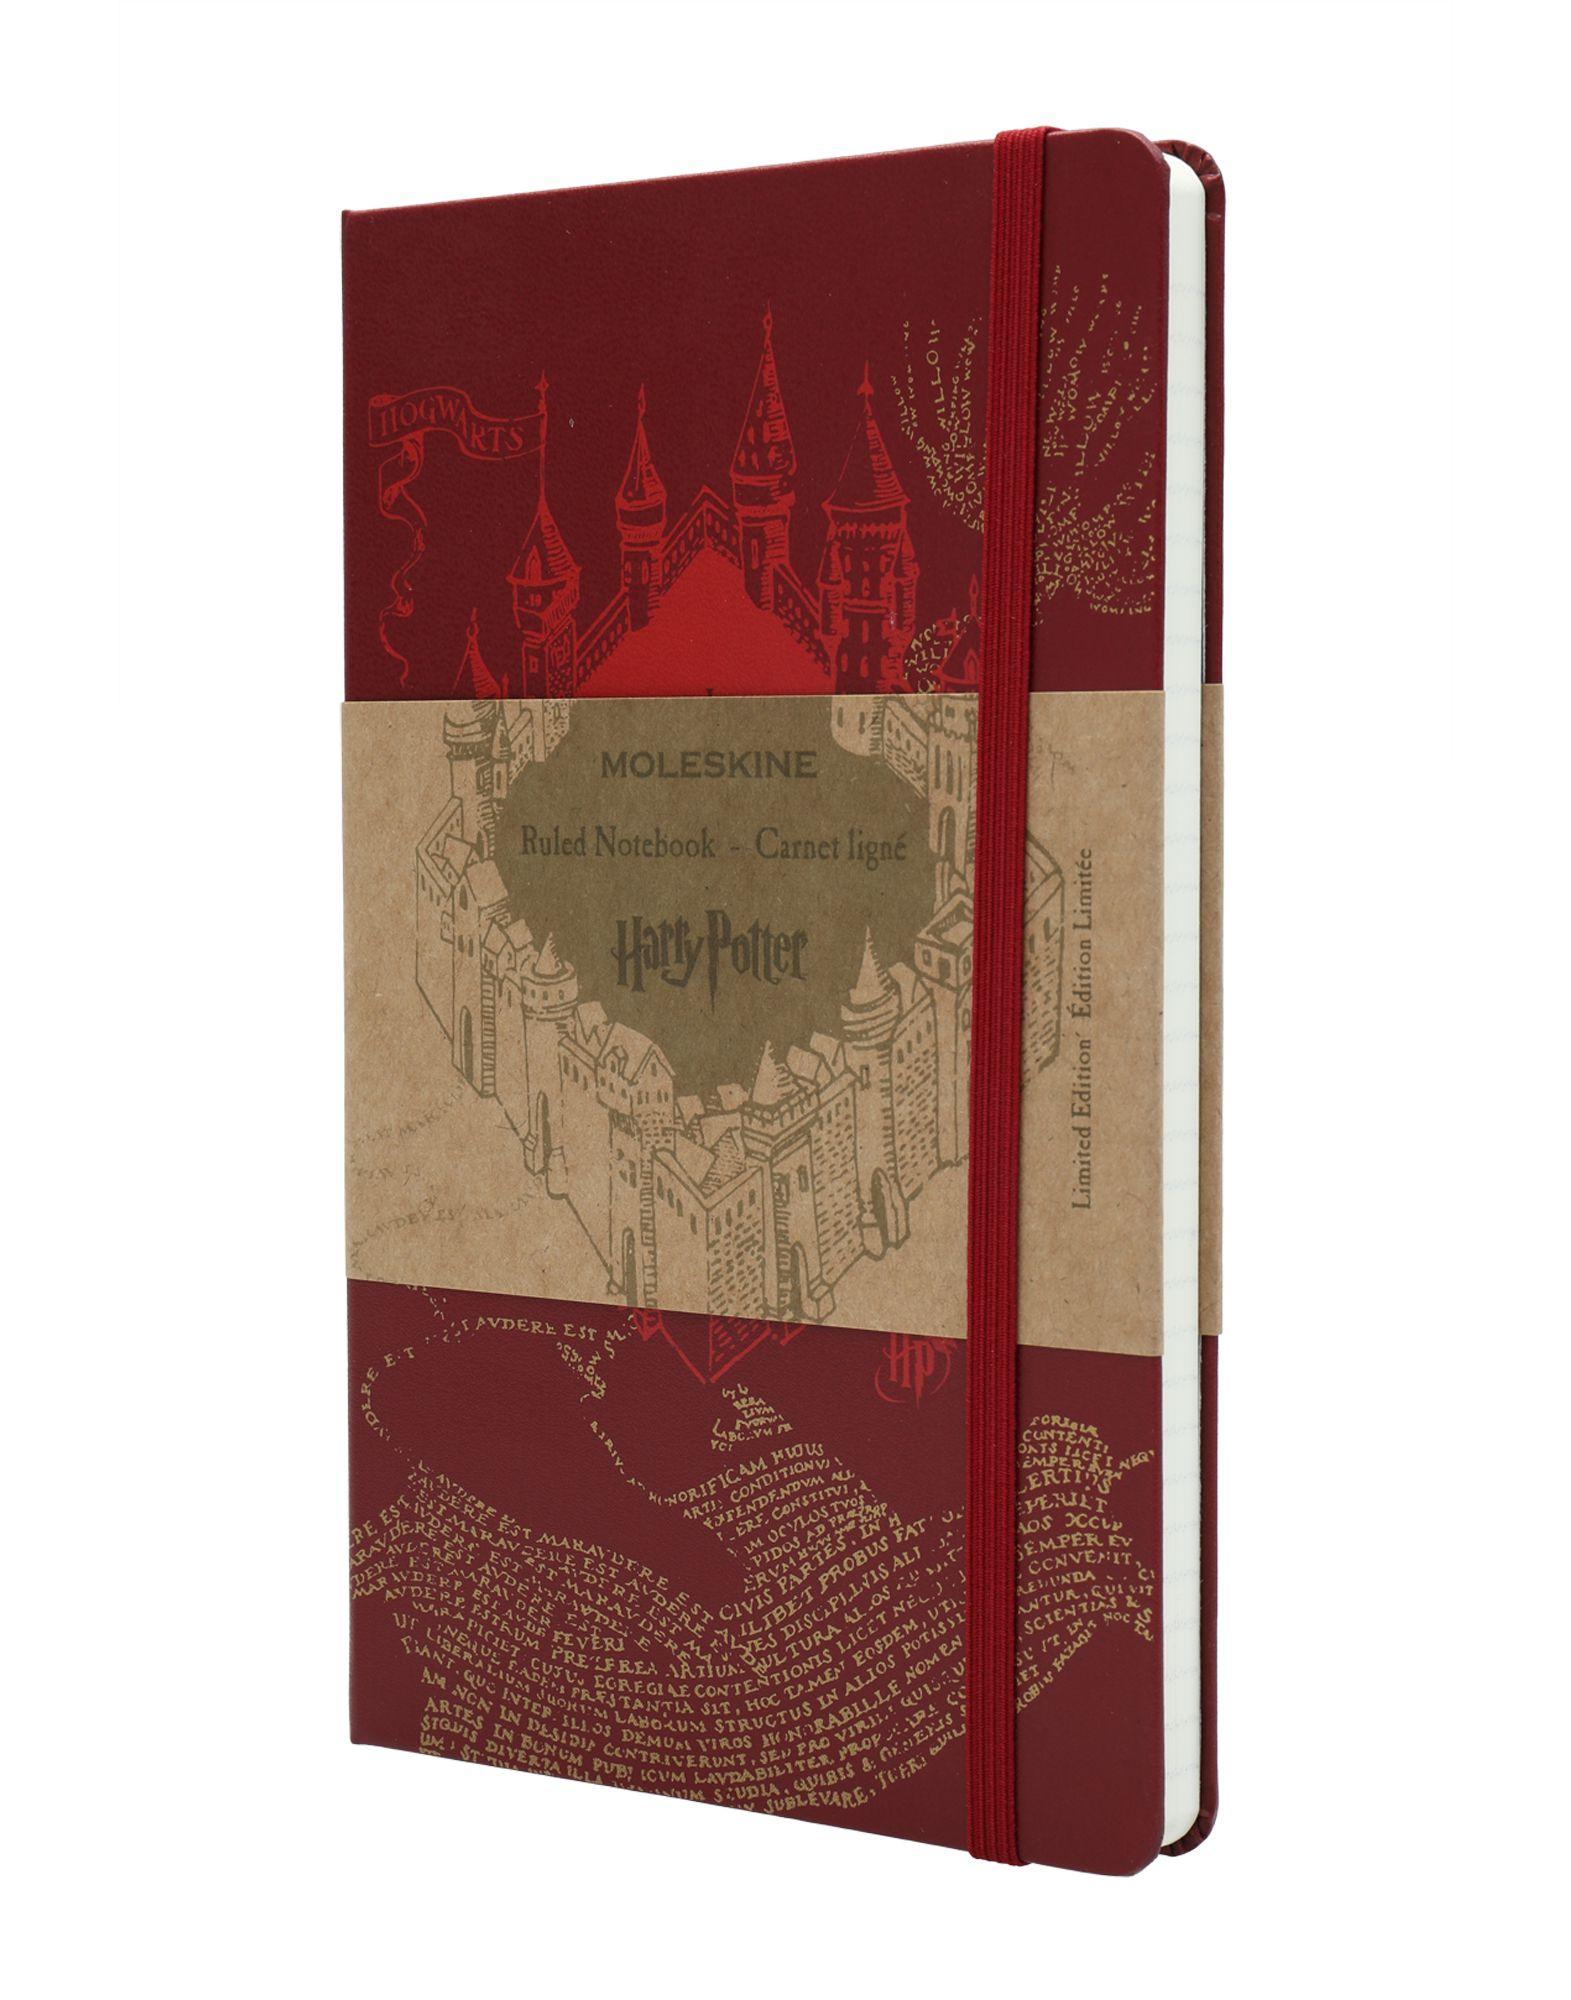 MOLESKINE Записная книжка записная книжка мышка с сердцем 28909